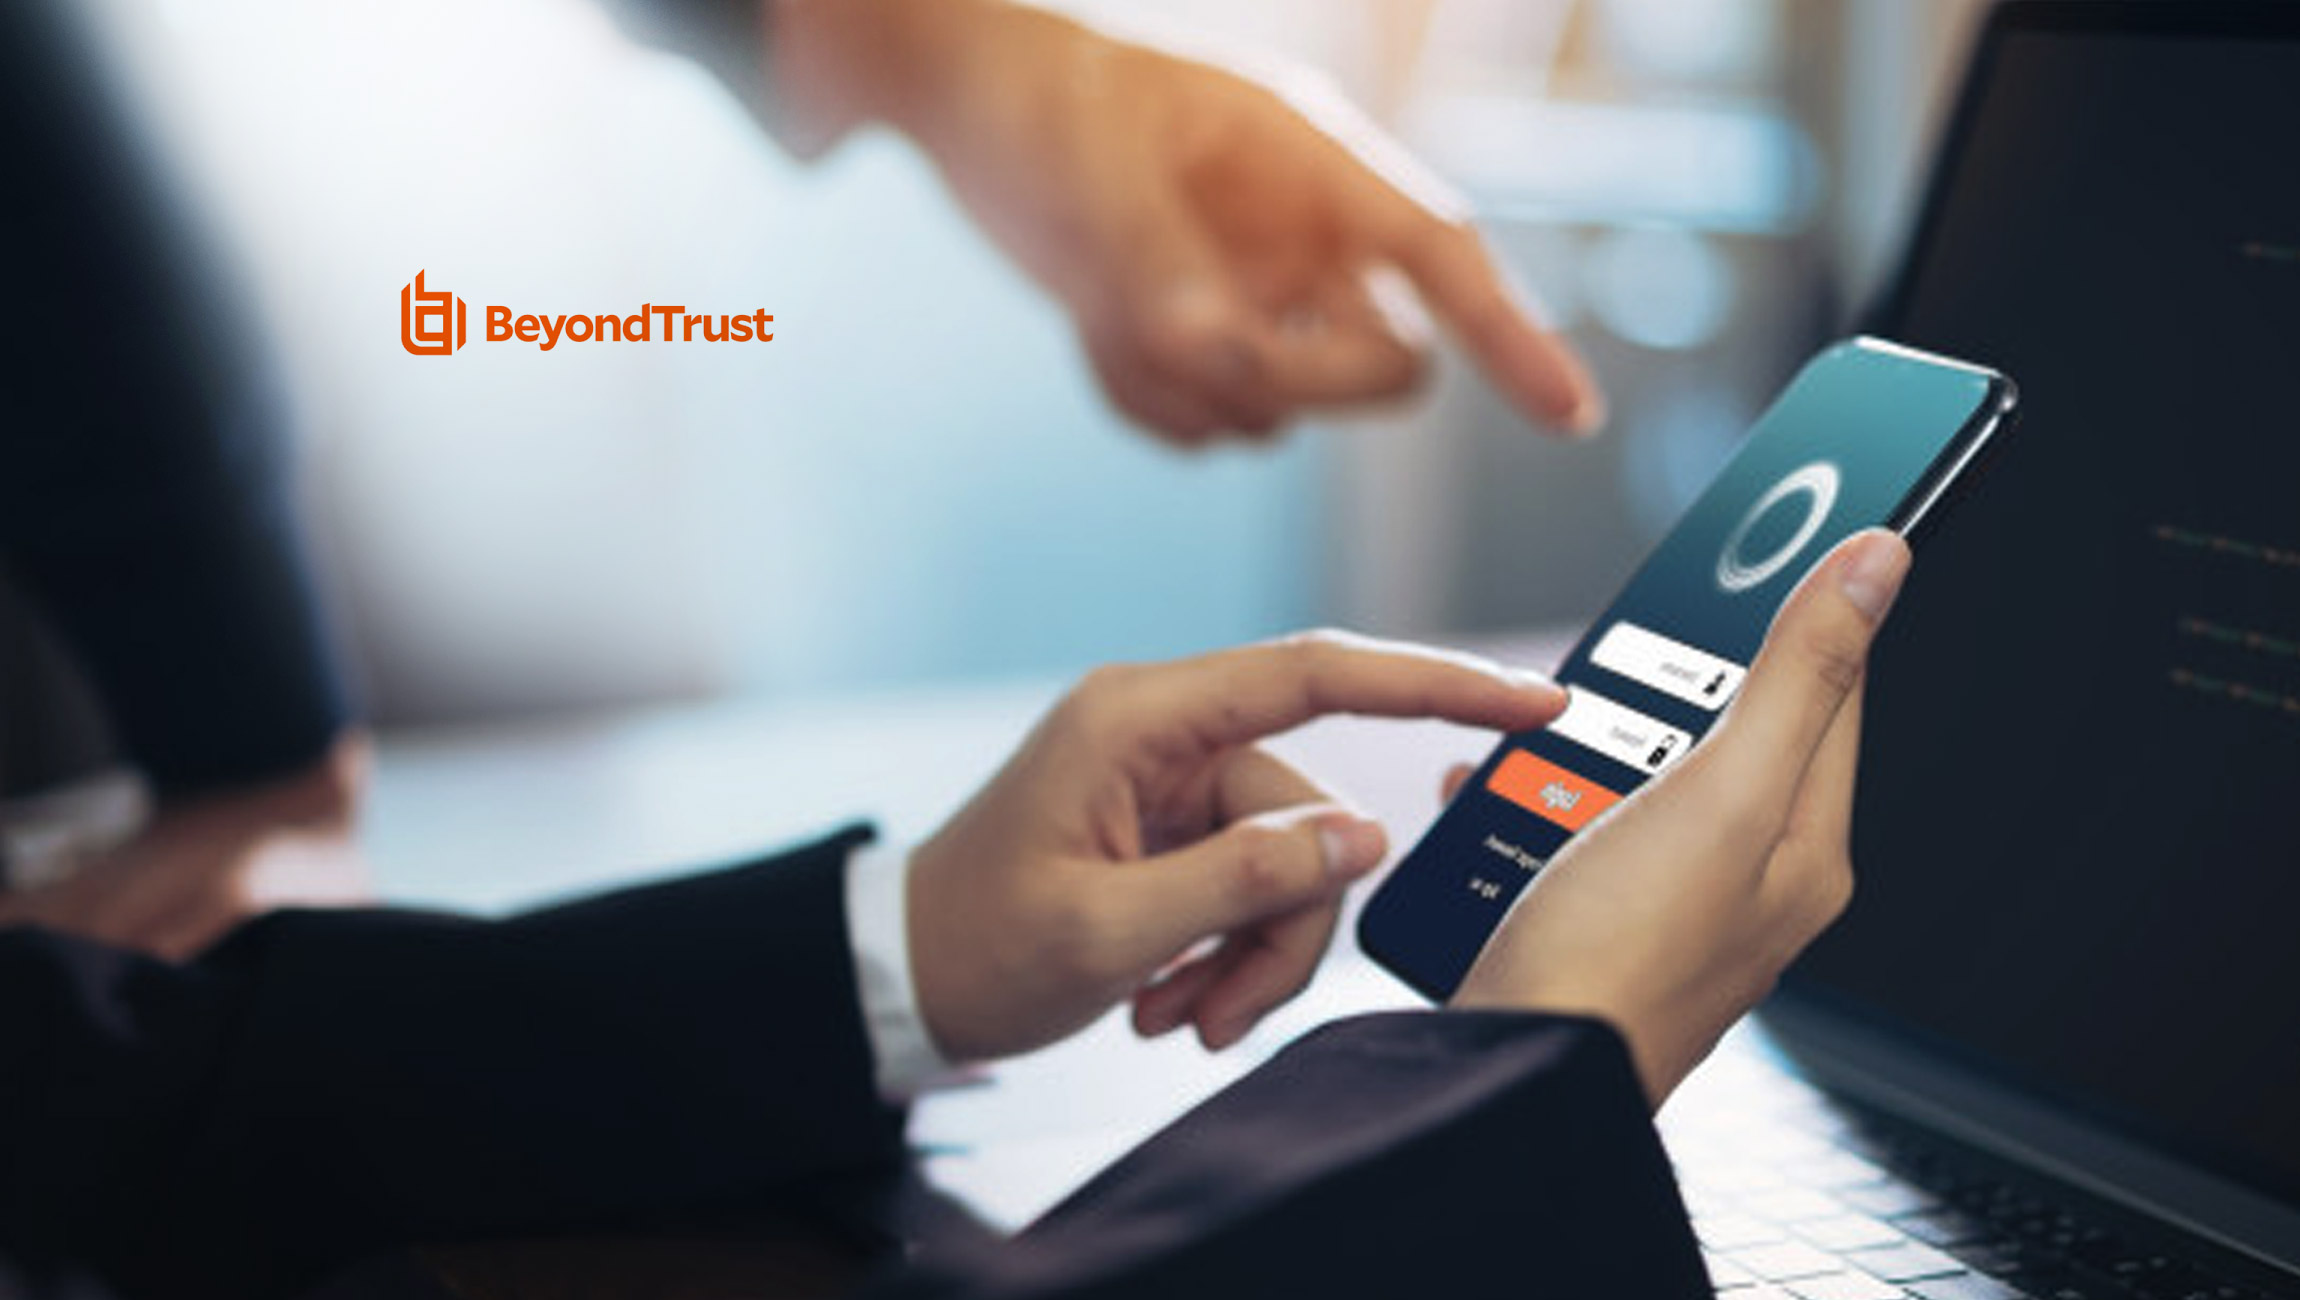 BeyondTrust Named a Leader in 2020 Gartner Magic Quadrant for Privileged Access Management